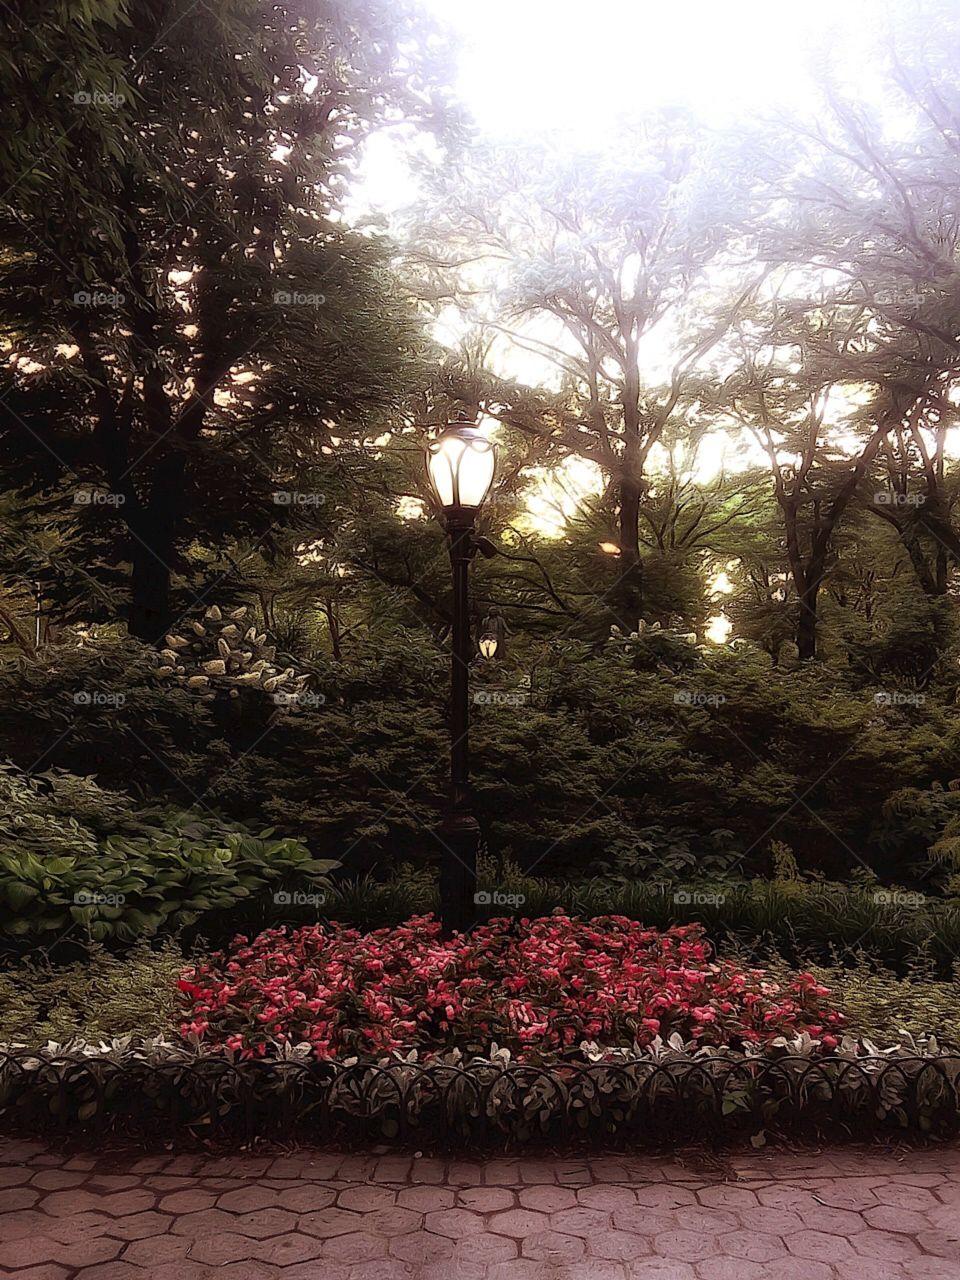 Olmsted Flower Bed - Central Park, New York City. Instagram,@PennyPeronto